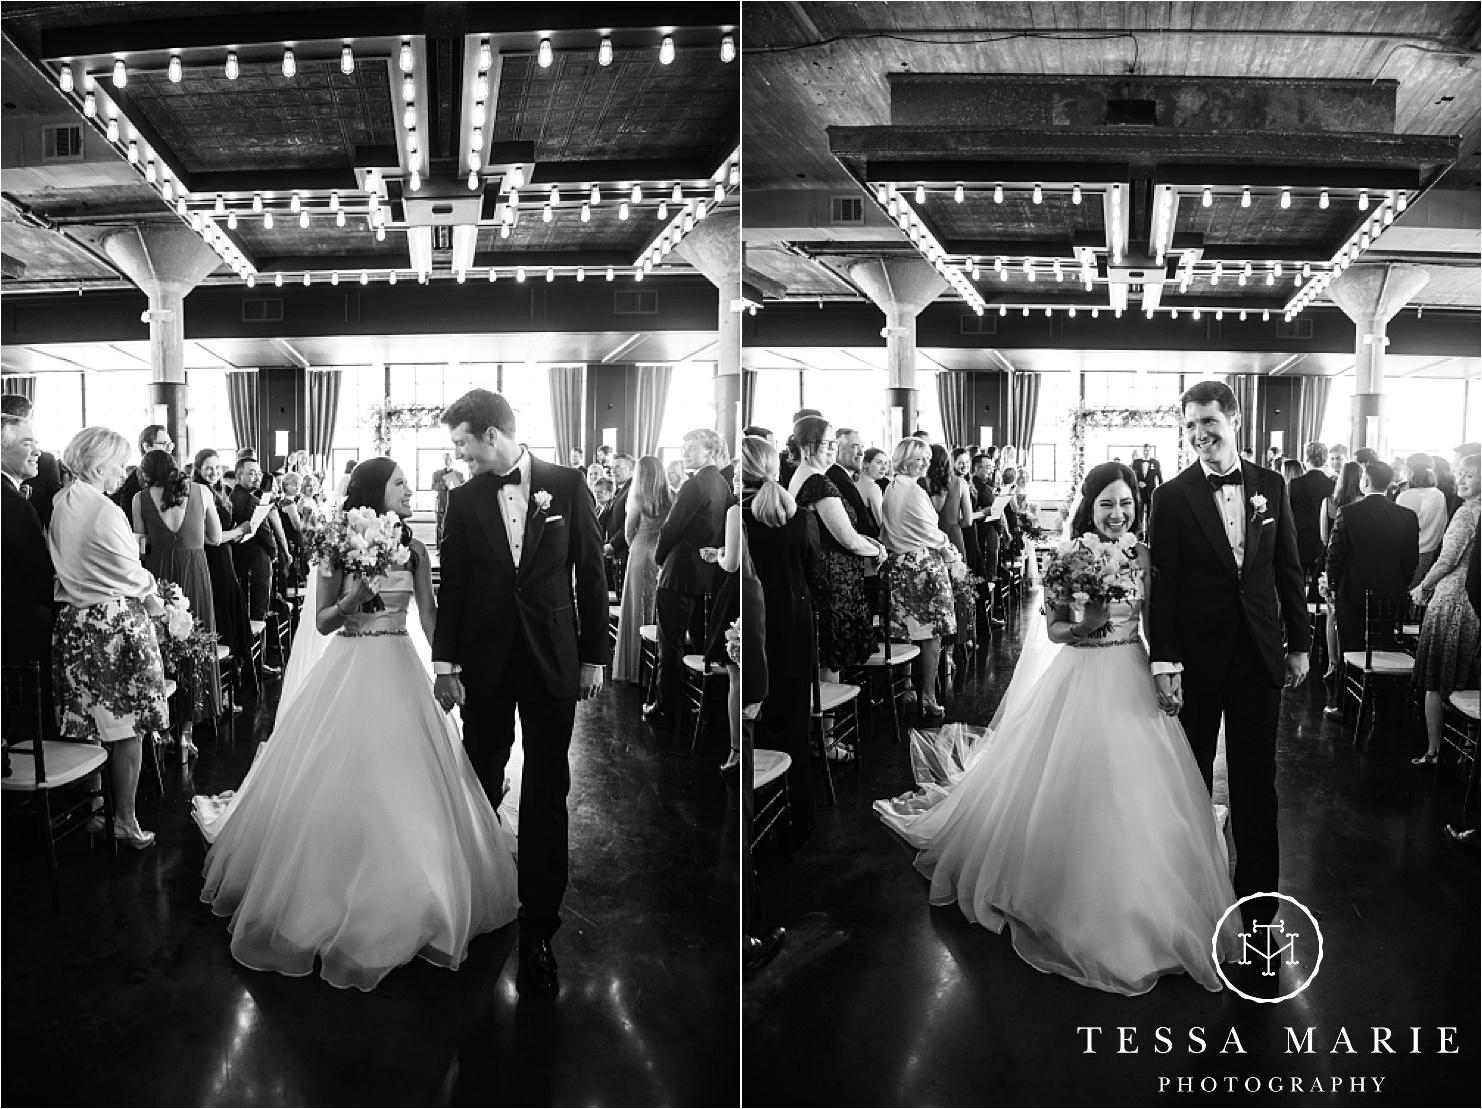 Tessa_marie_weddings_houston_wedding_photographer_The_astorian_0124.jpg